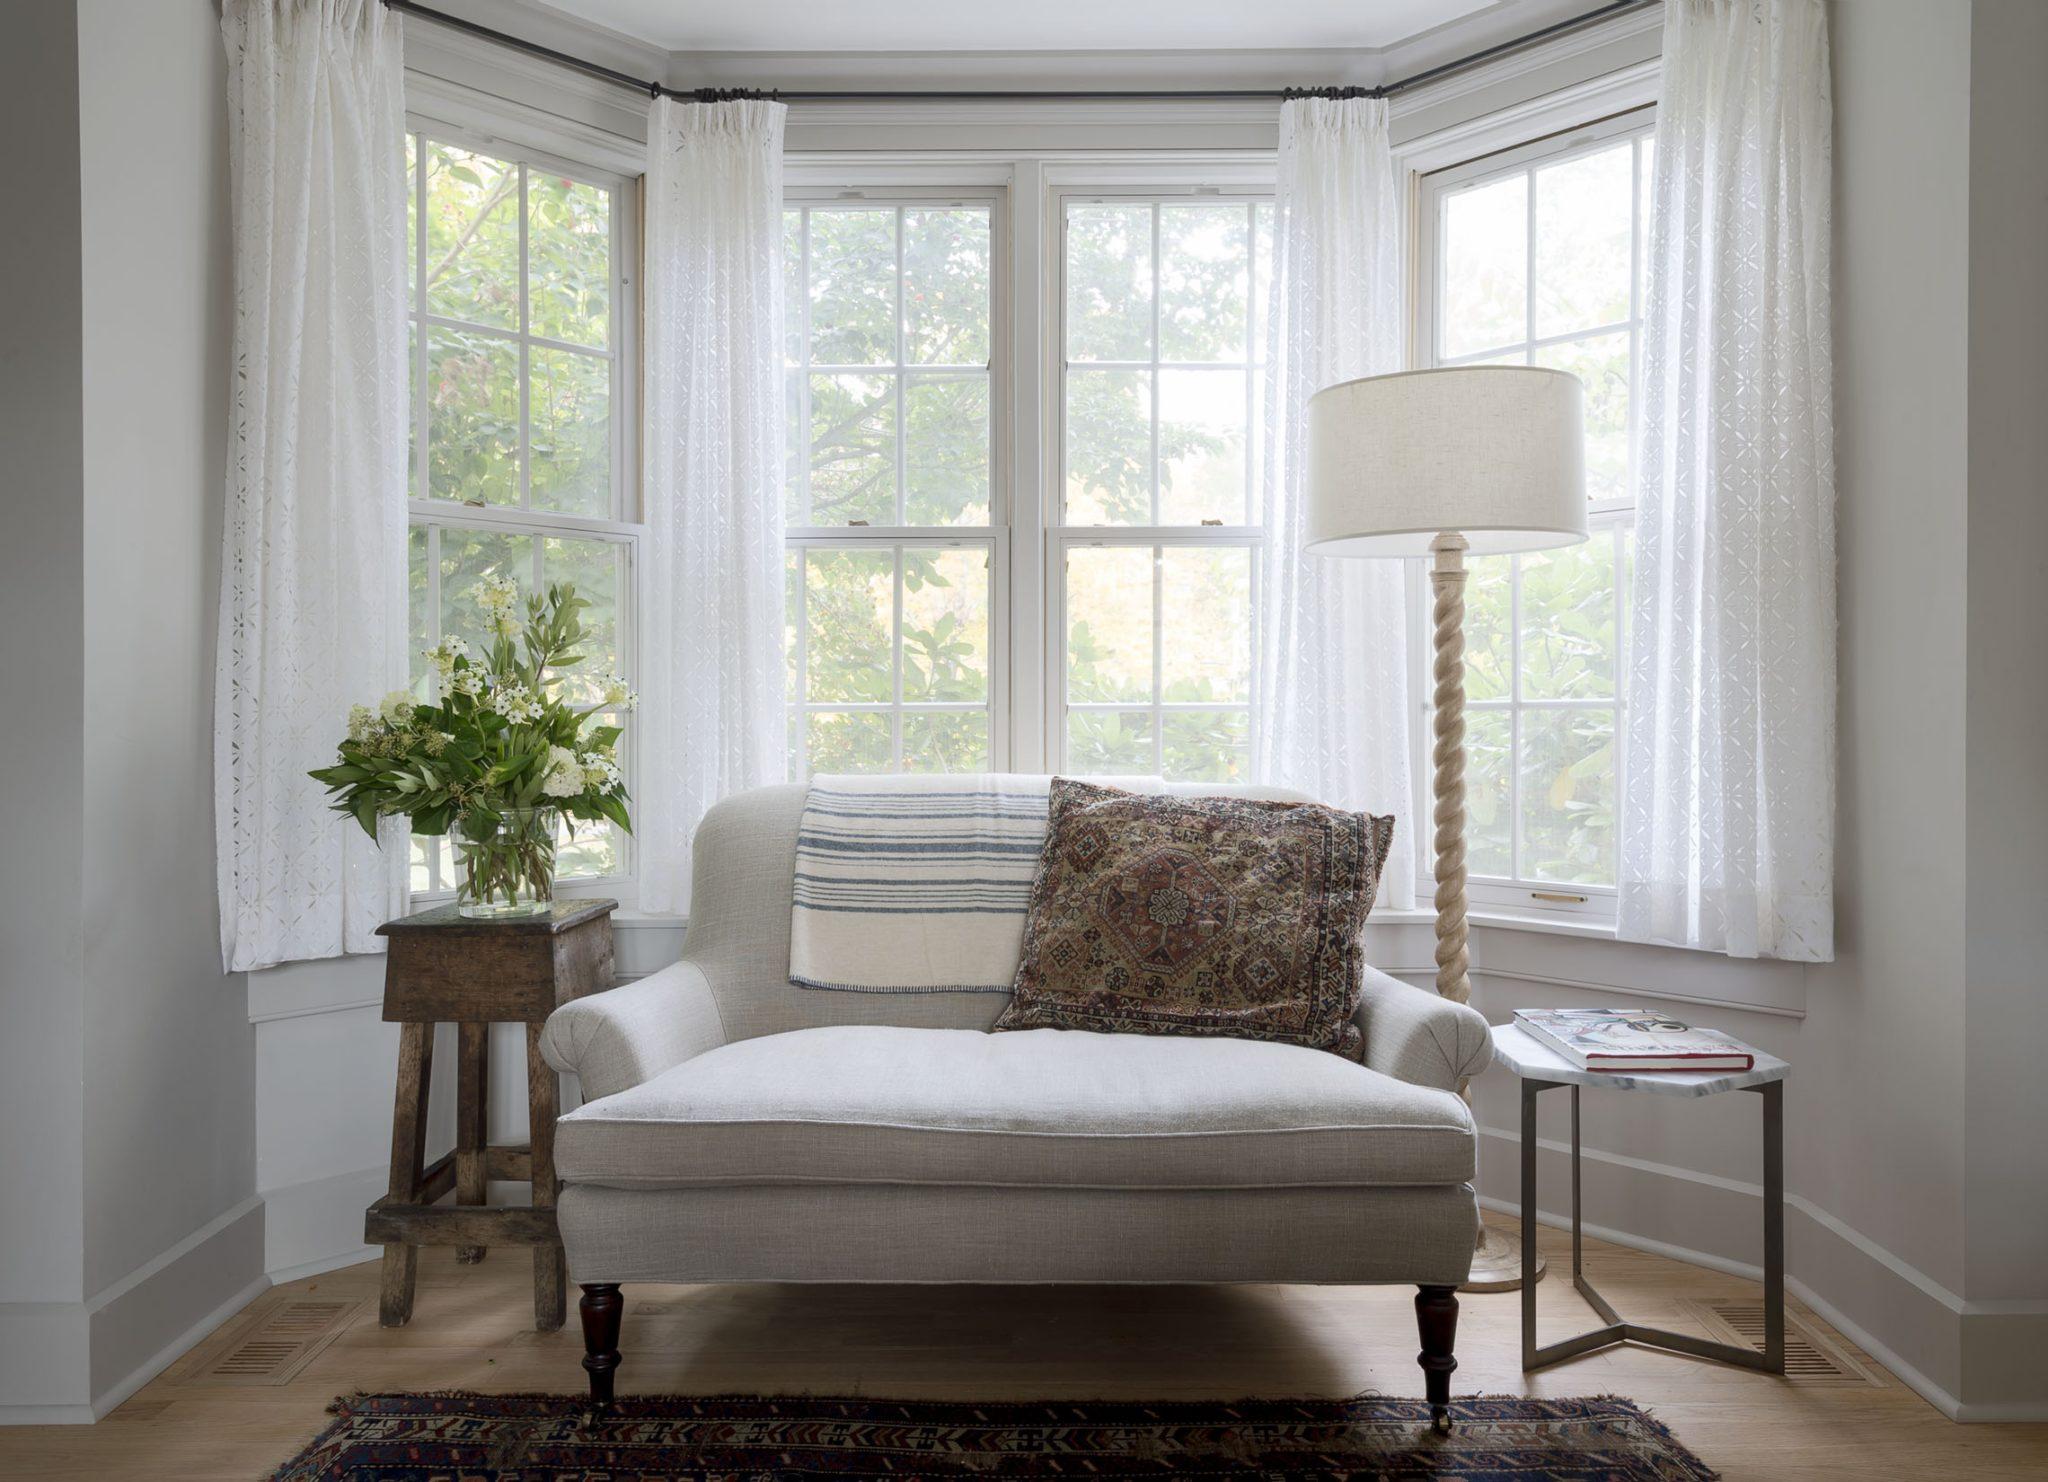 Ideas For Decorating Around Bay Windows Chairish Blog